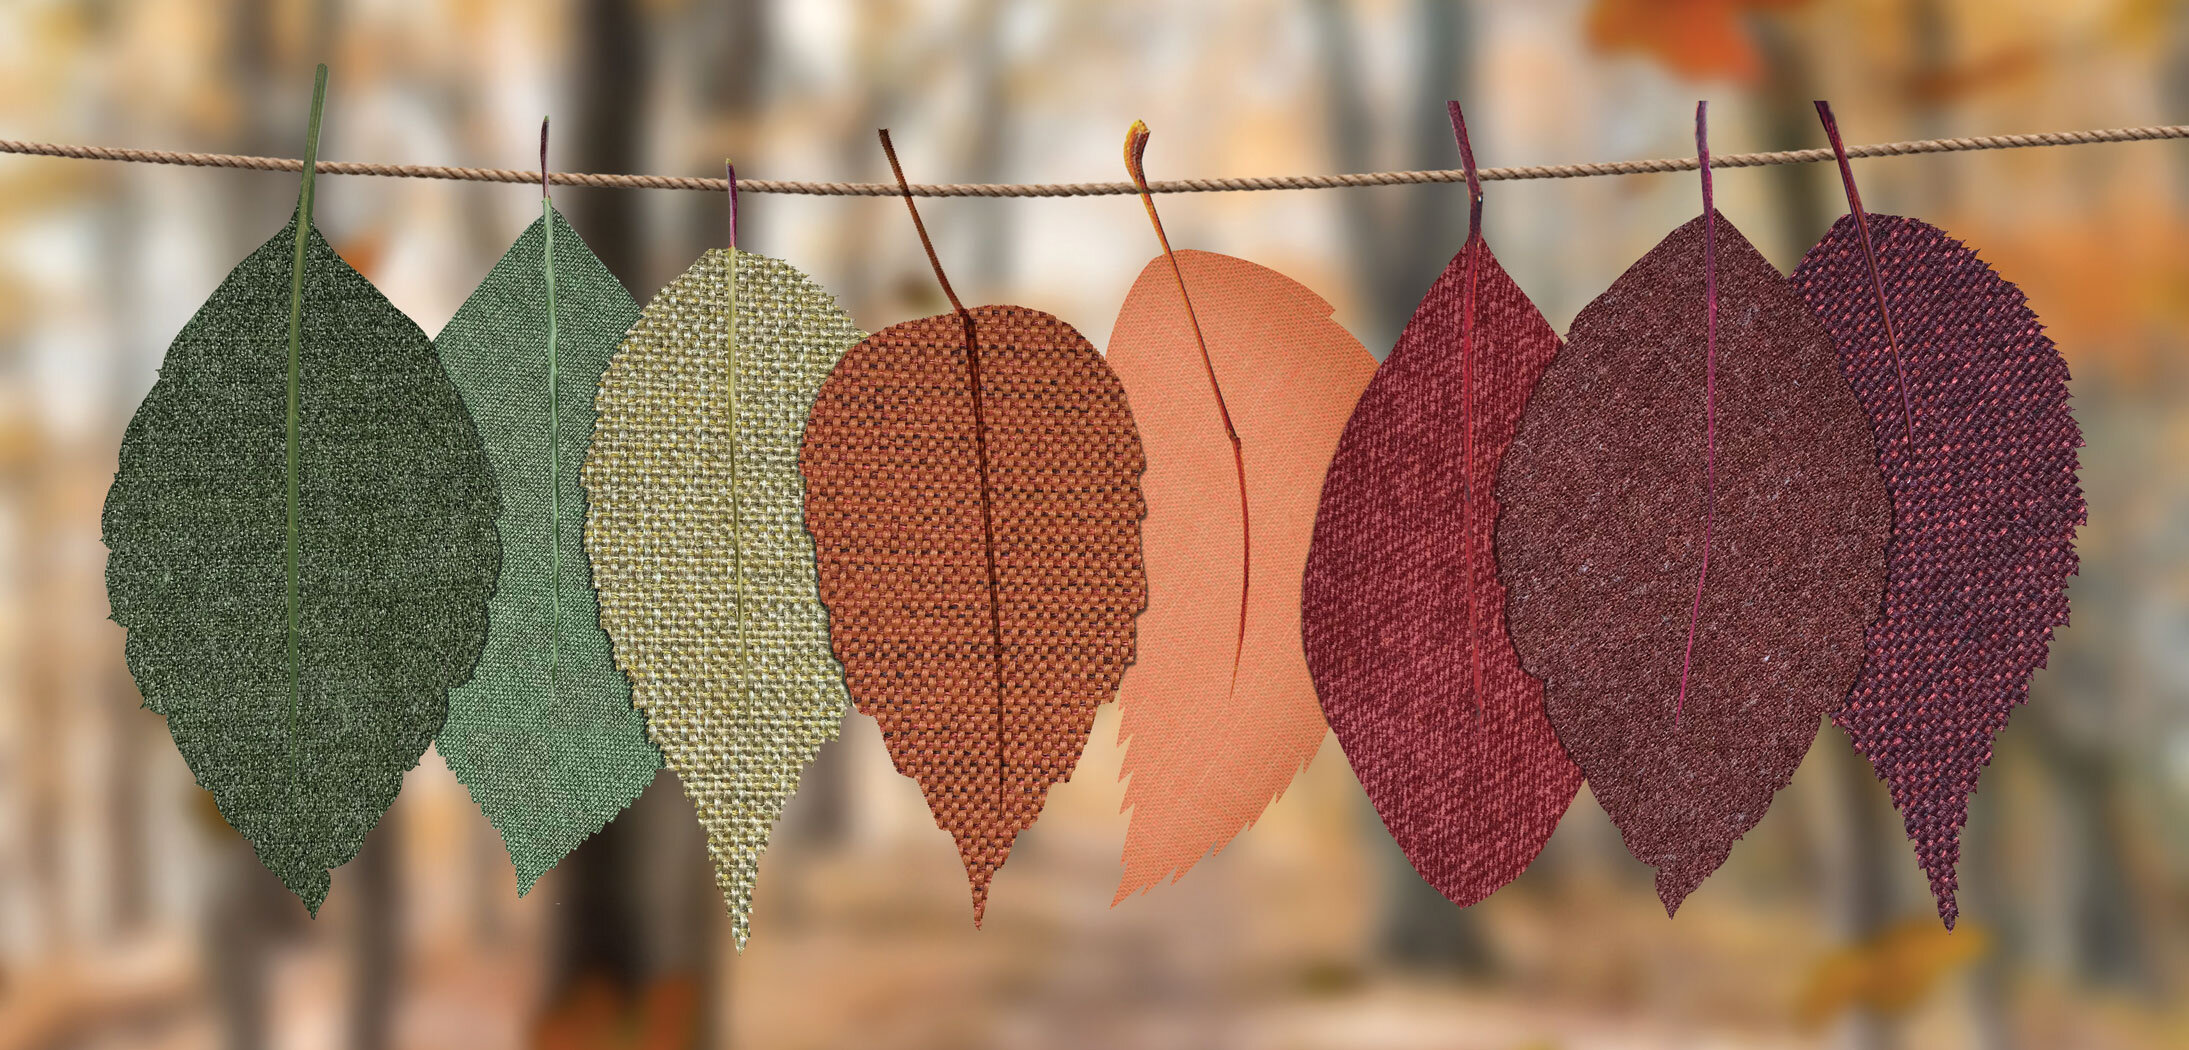 autumn-decoration-autumn-mood-forest-bright-1389460.jpg